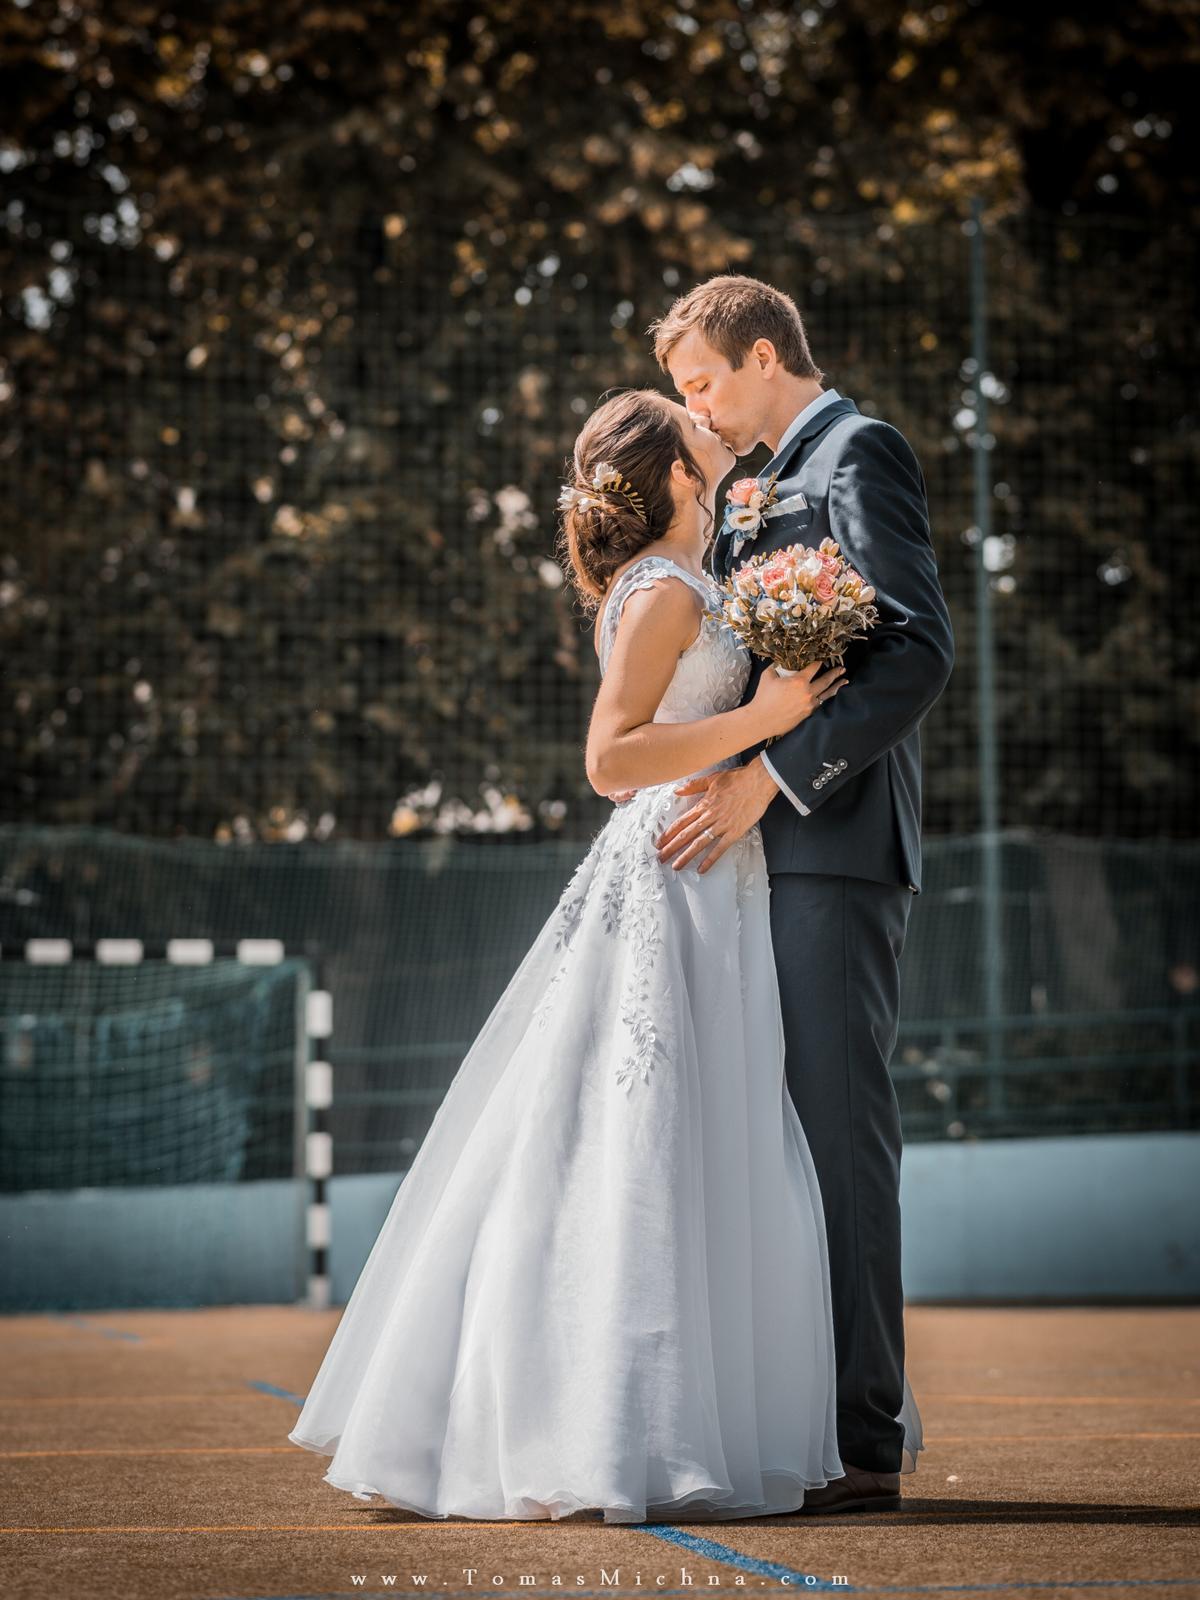 ♥ Helča & Martin ♥ 15.6.2019 ♥ - Obrázek č. 14